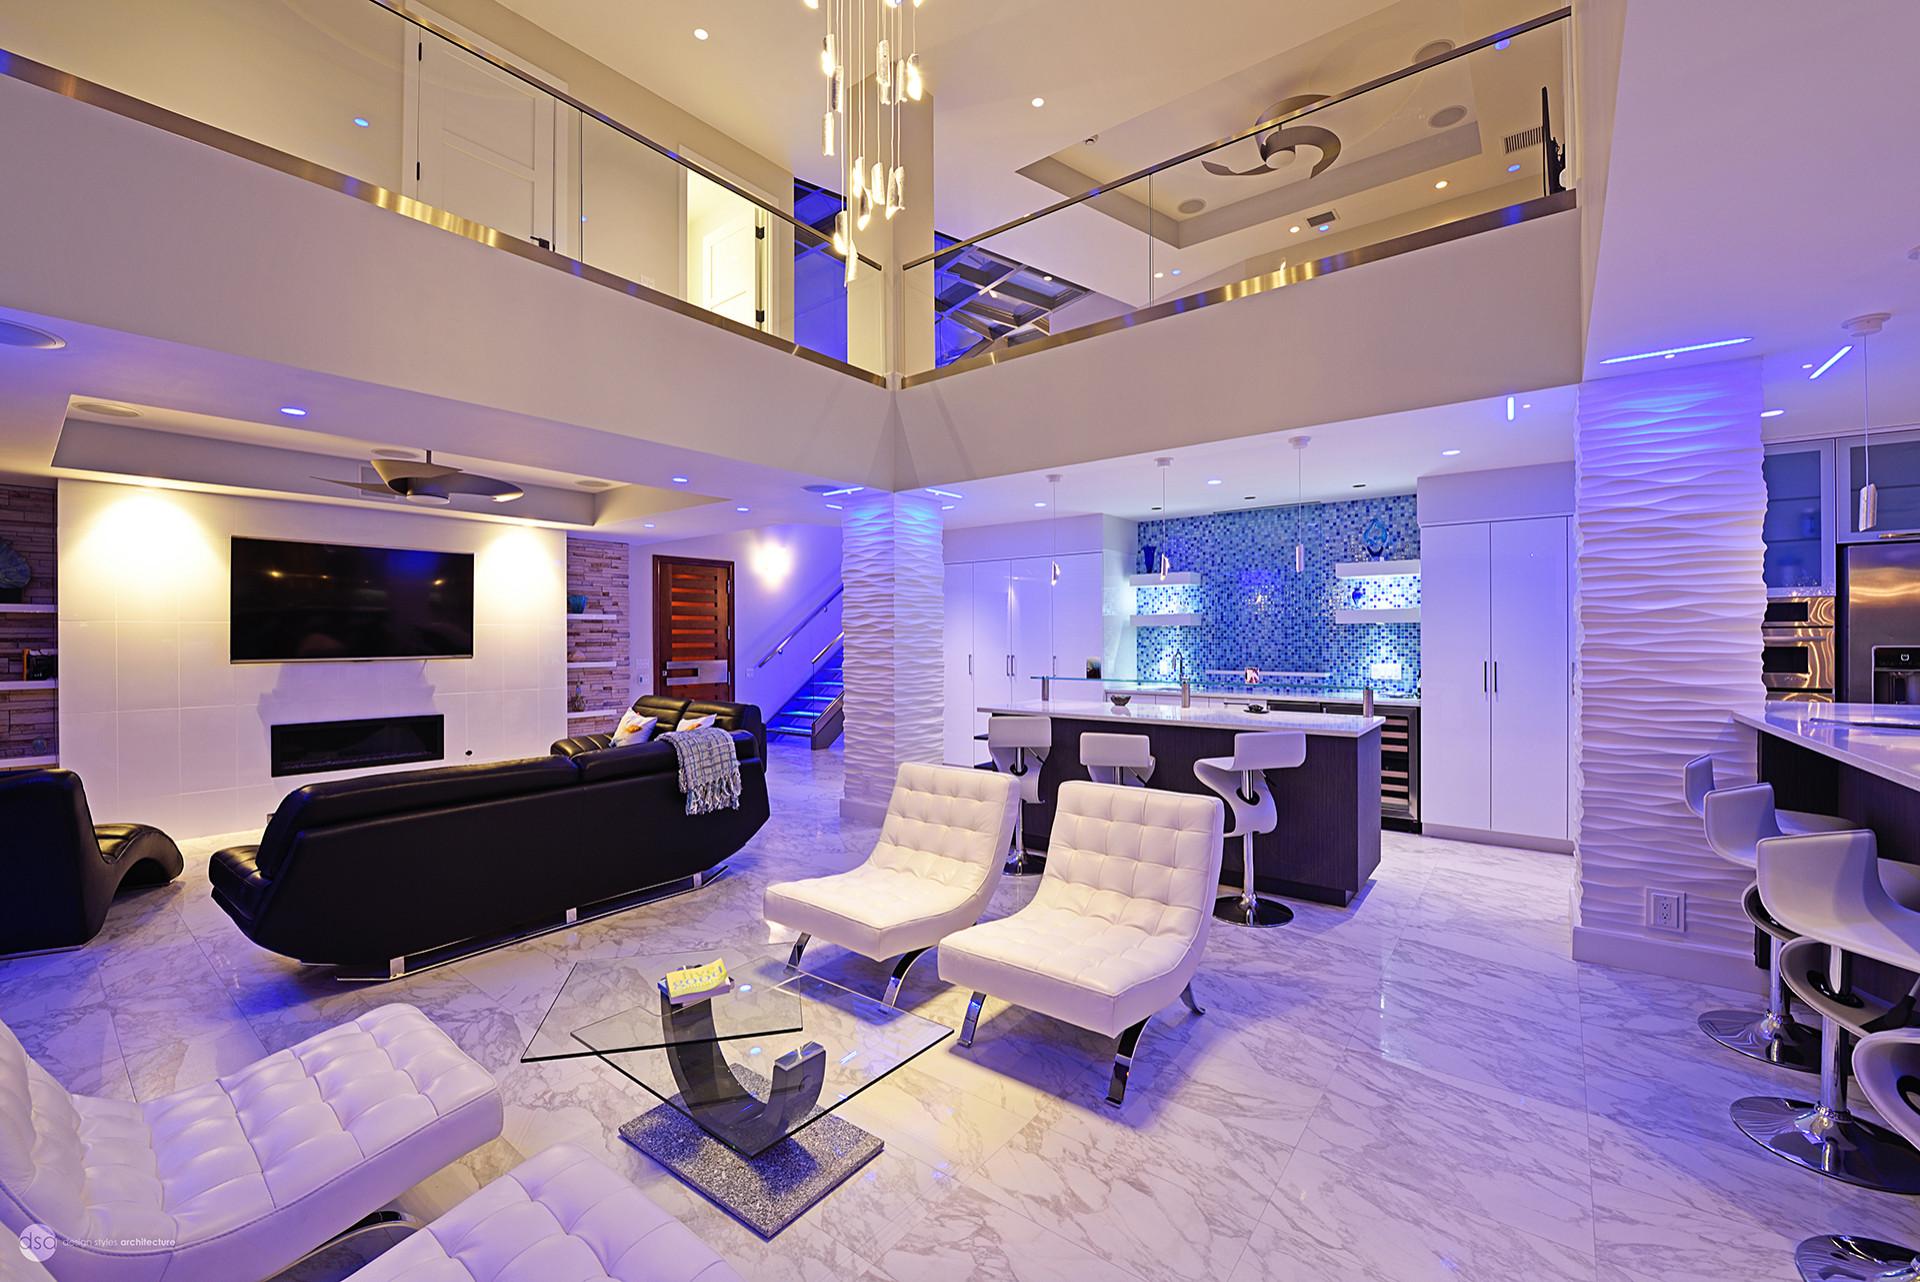 75 Beautiful Purple Marble Floor Living Room Pictures Ideas December 2020 Houzz